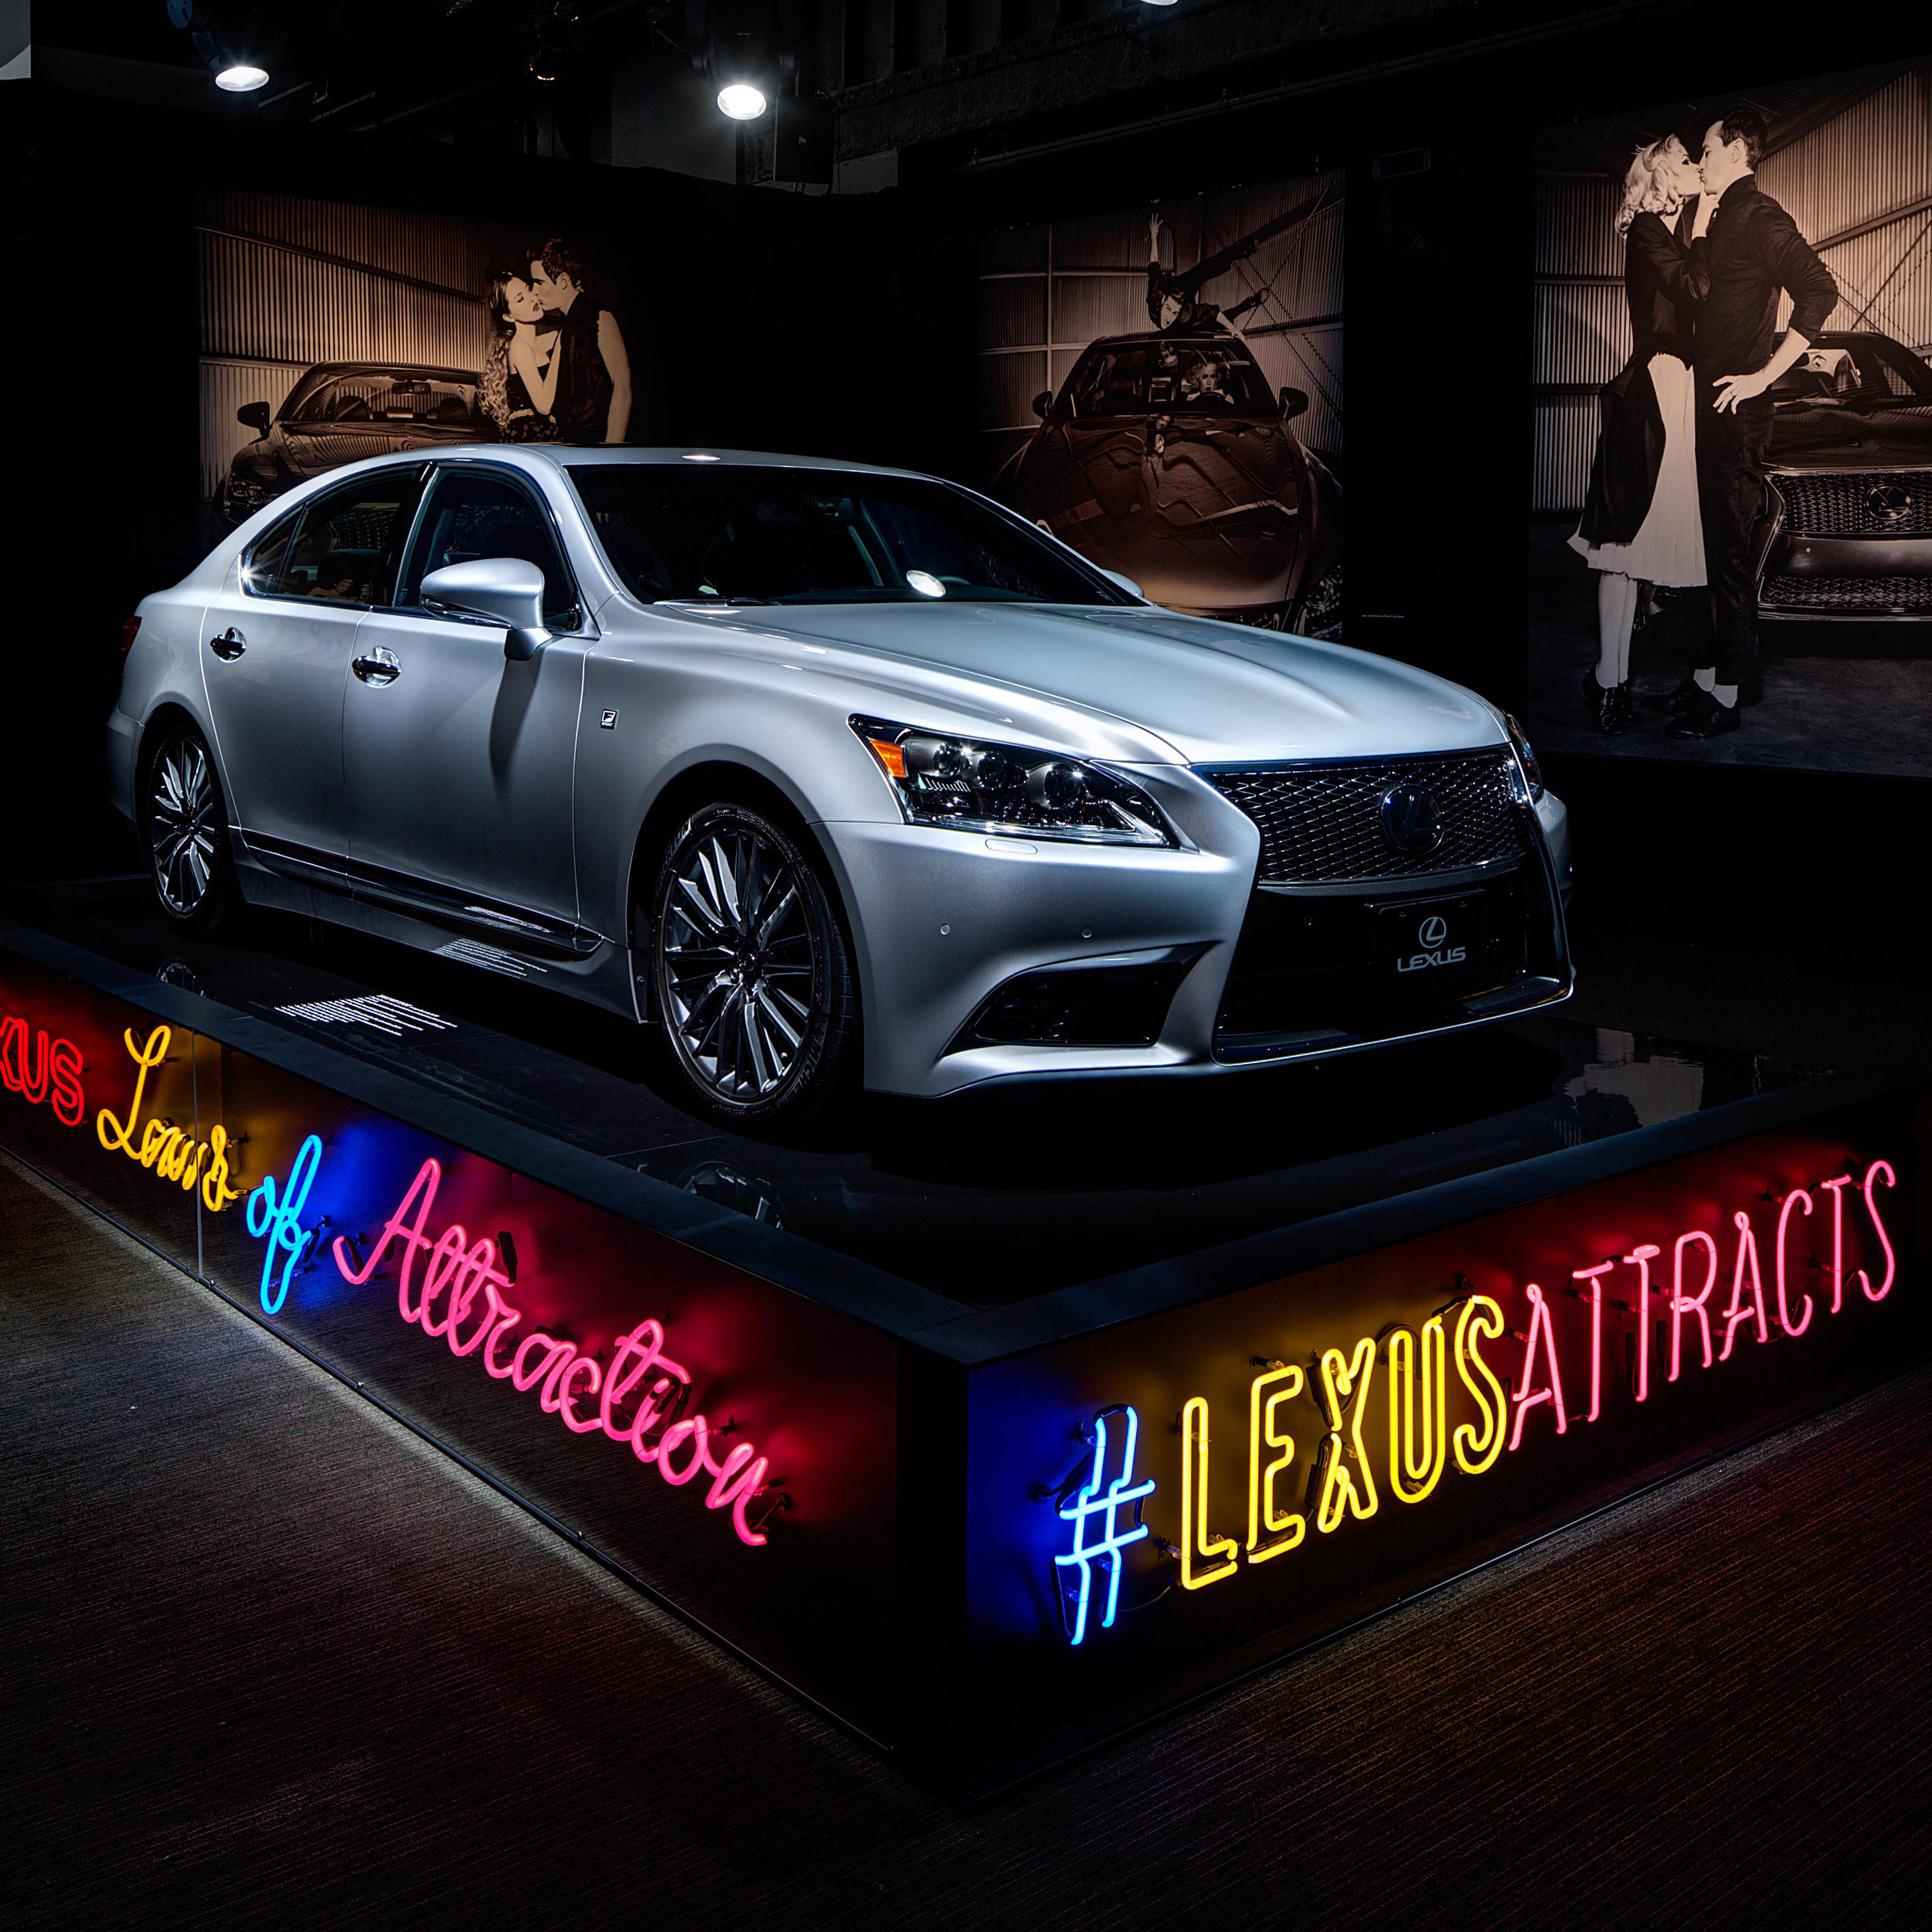 Lexus-Attracts-square.jpg